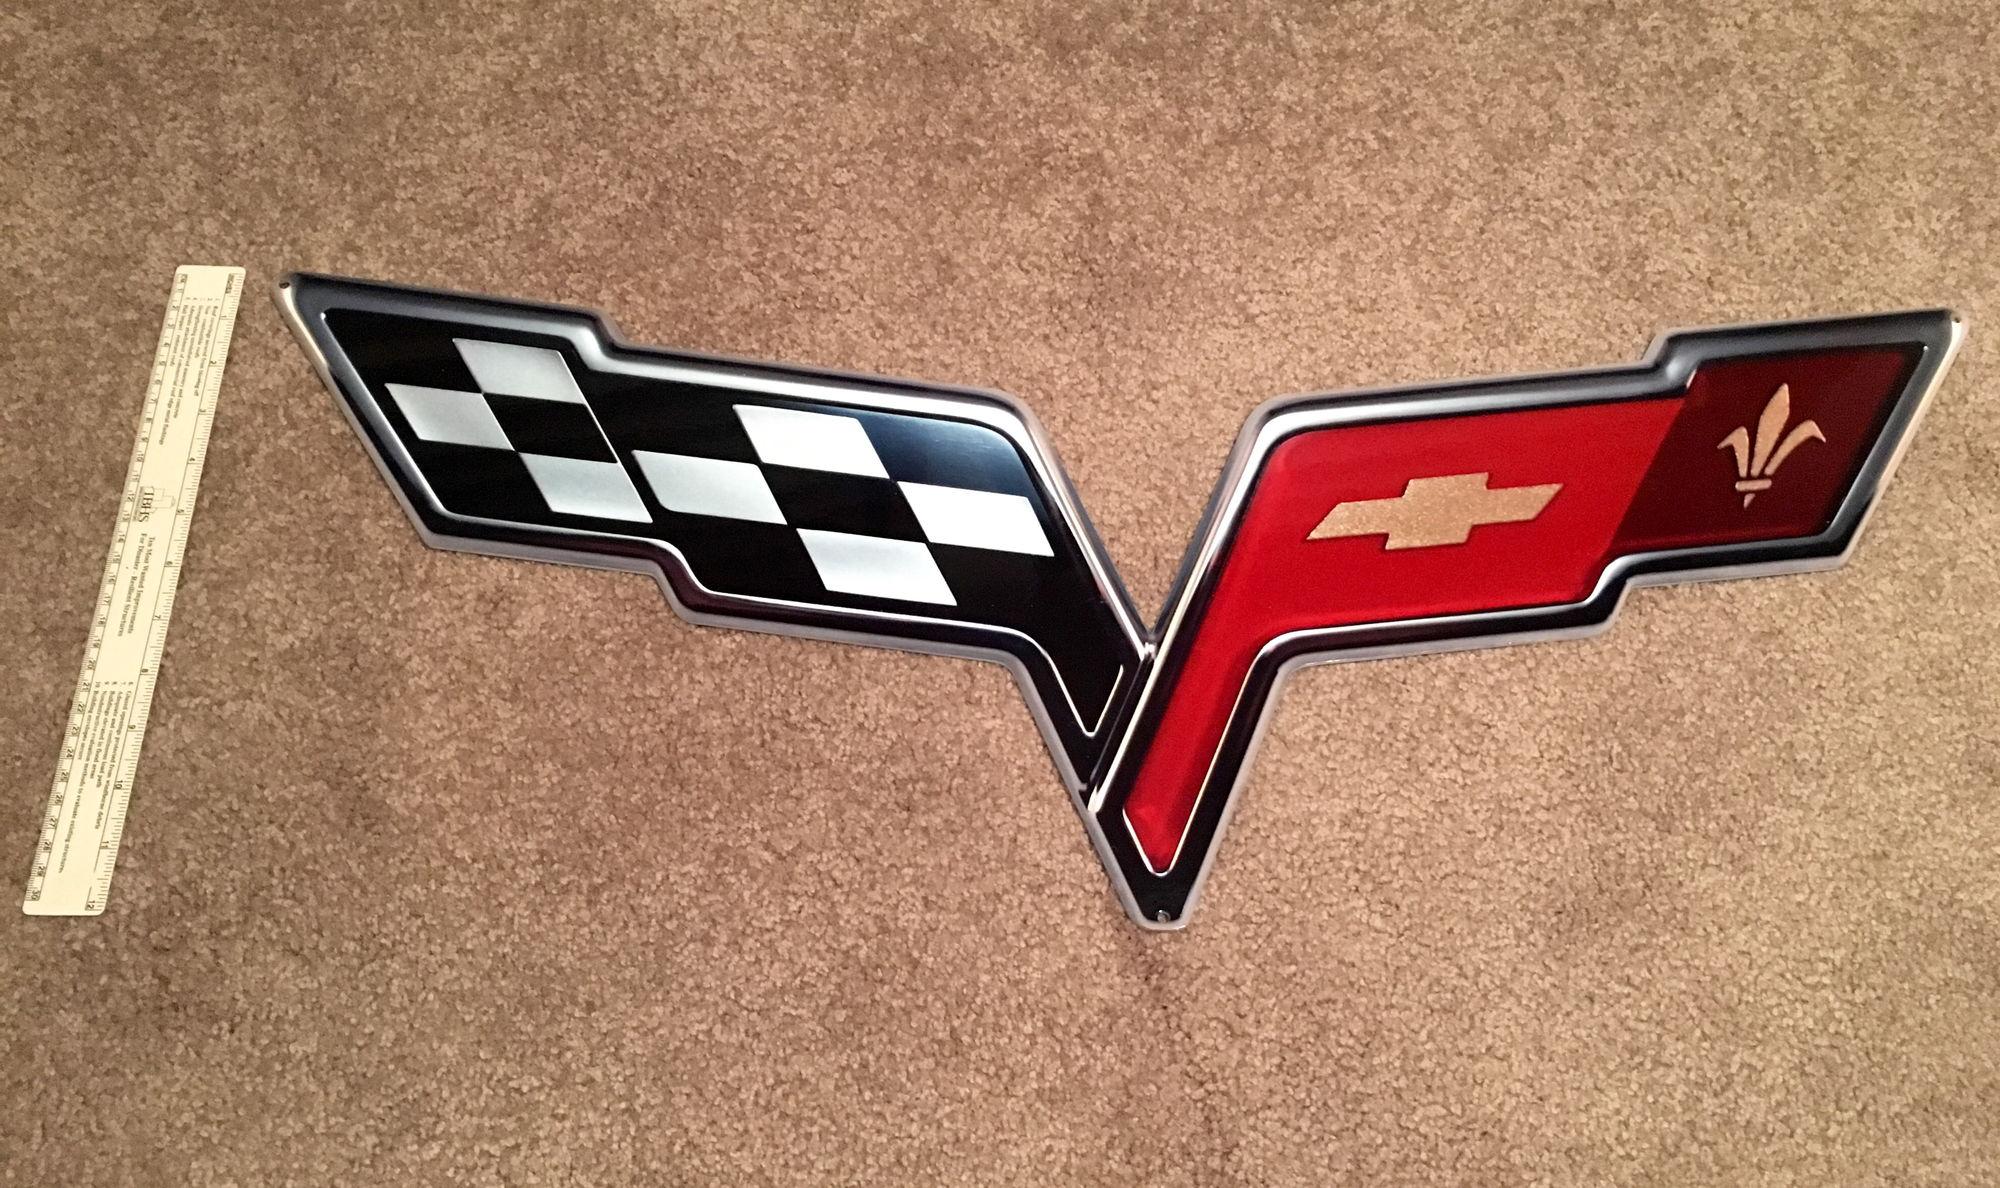 Corvette Signs Garage : C flags logo and z emblem steel wall signs garage art